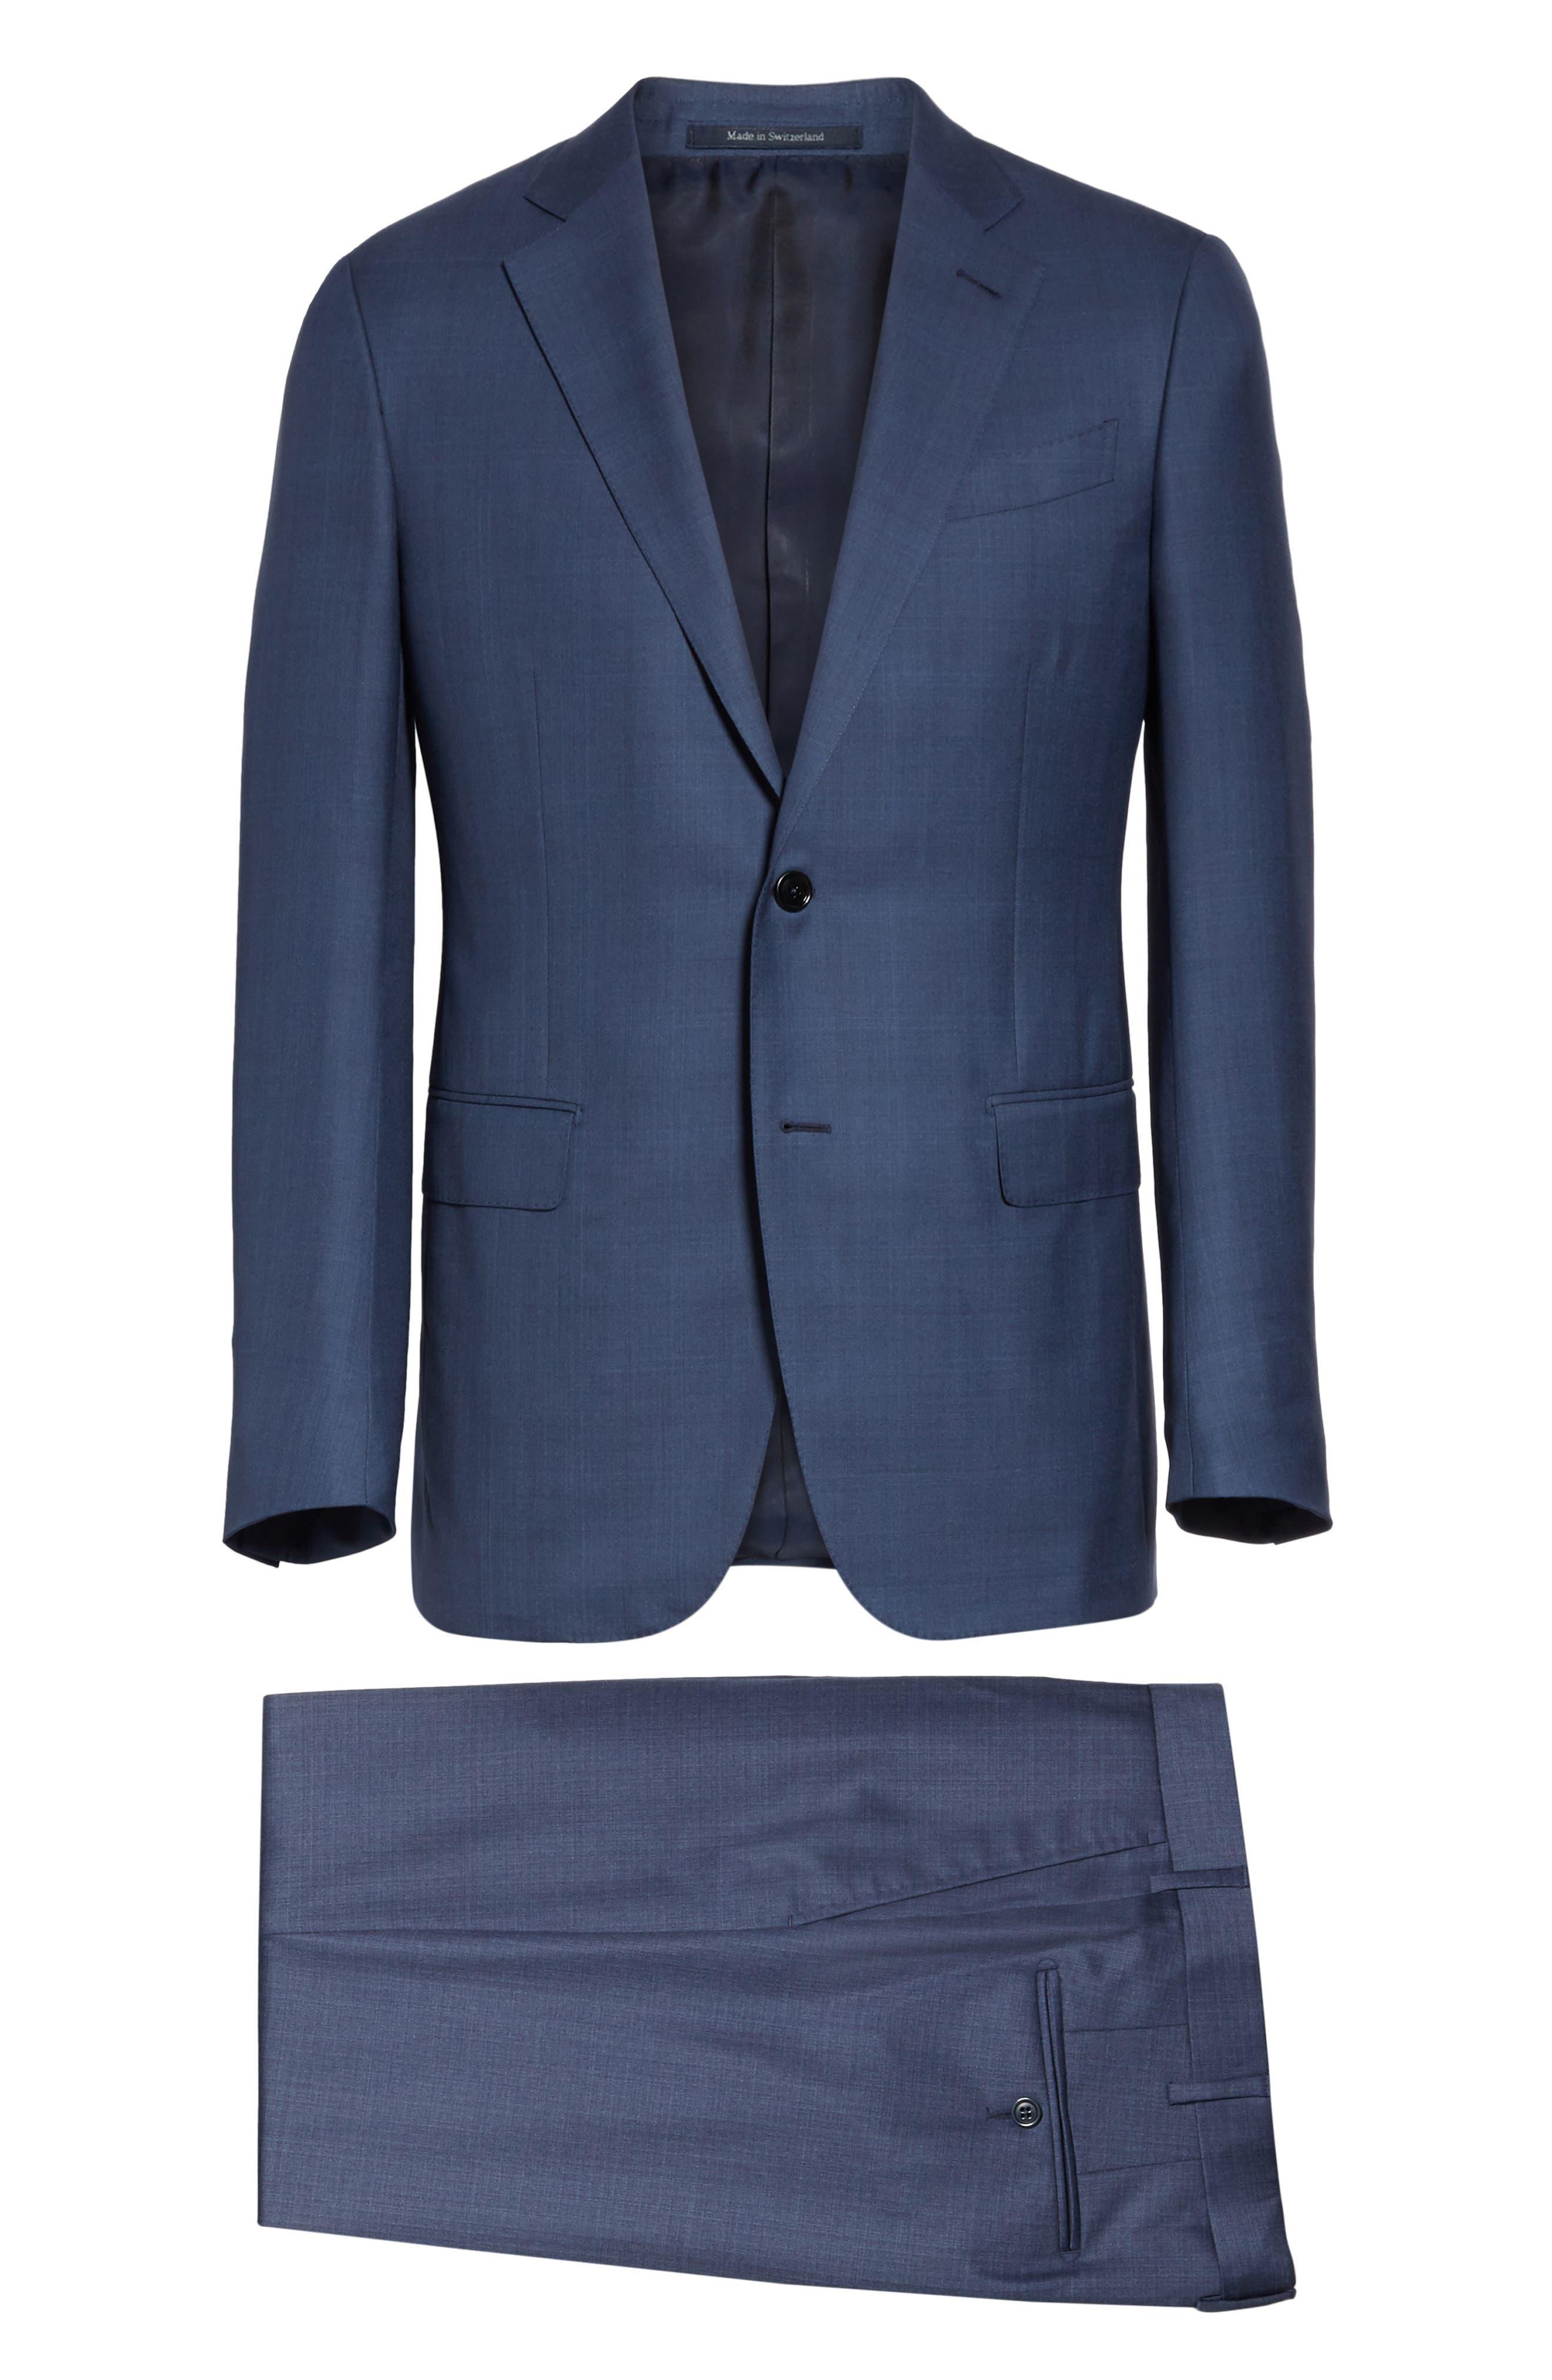 ERMENEGILDO ZEGNA, Trofeo Classic Fit Plaid Wool & Silk Suit, Alternate thumbnail 8, color, BLUE